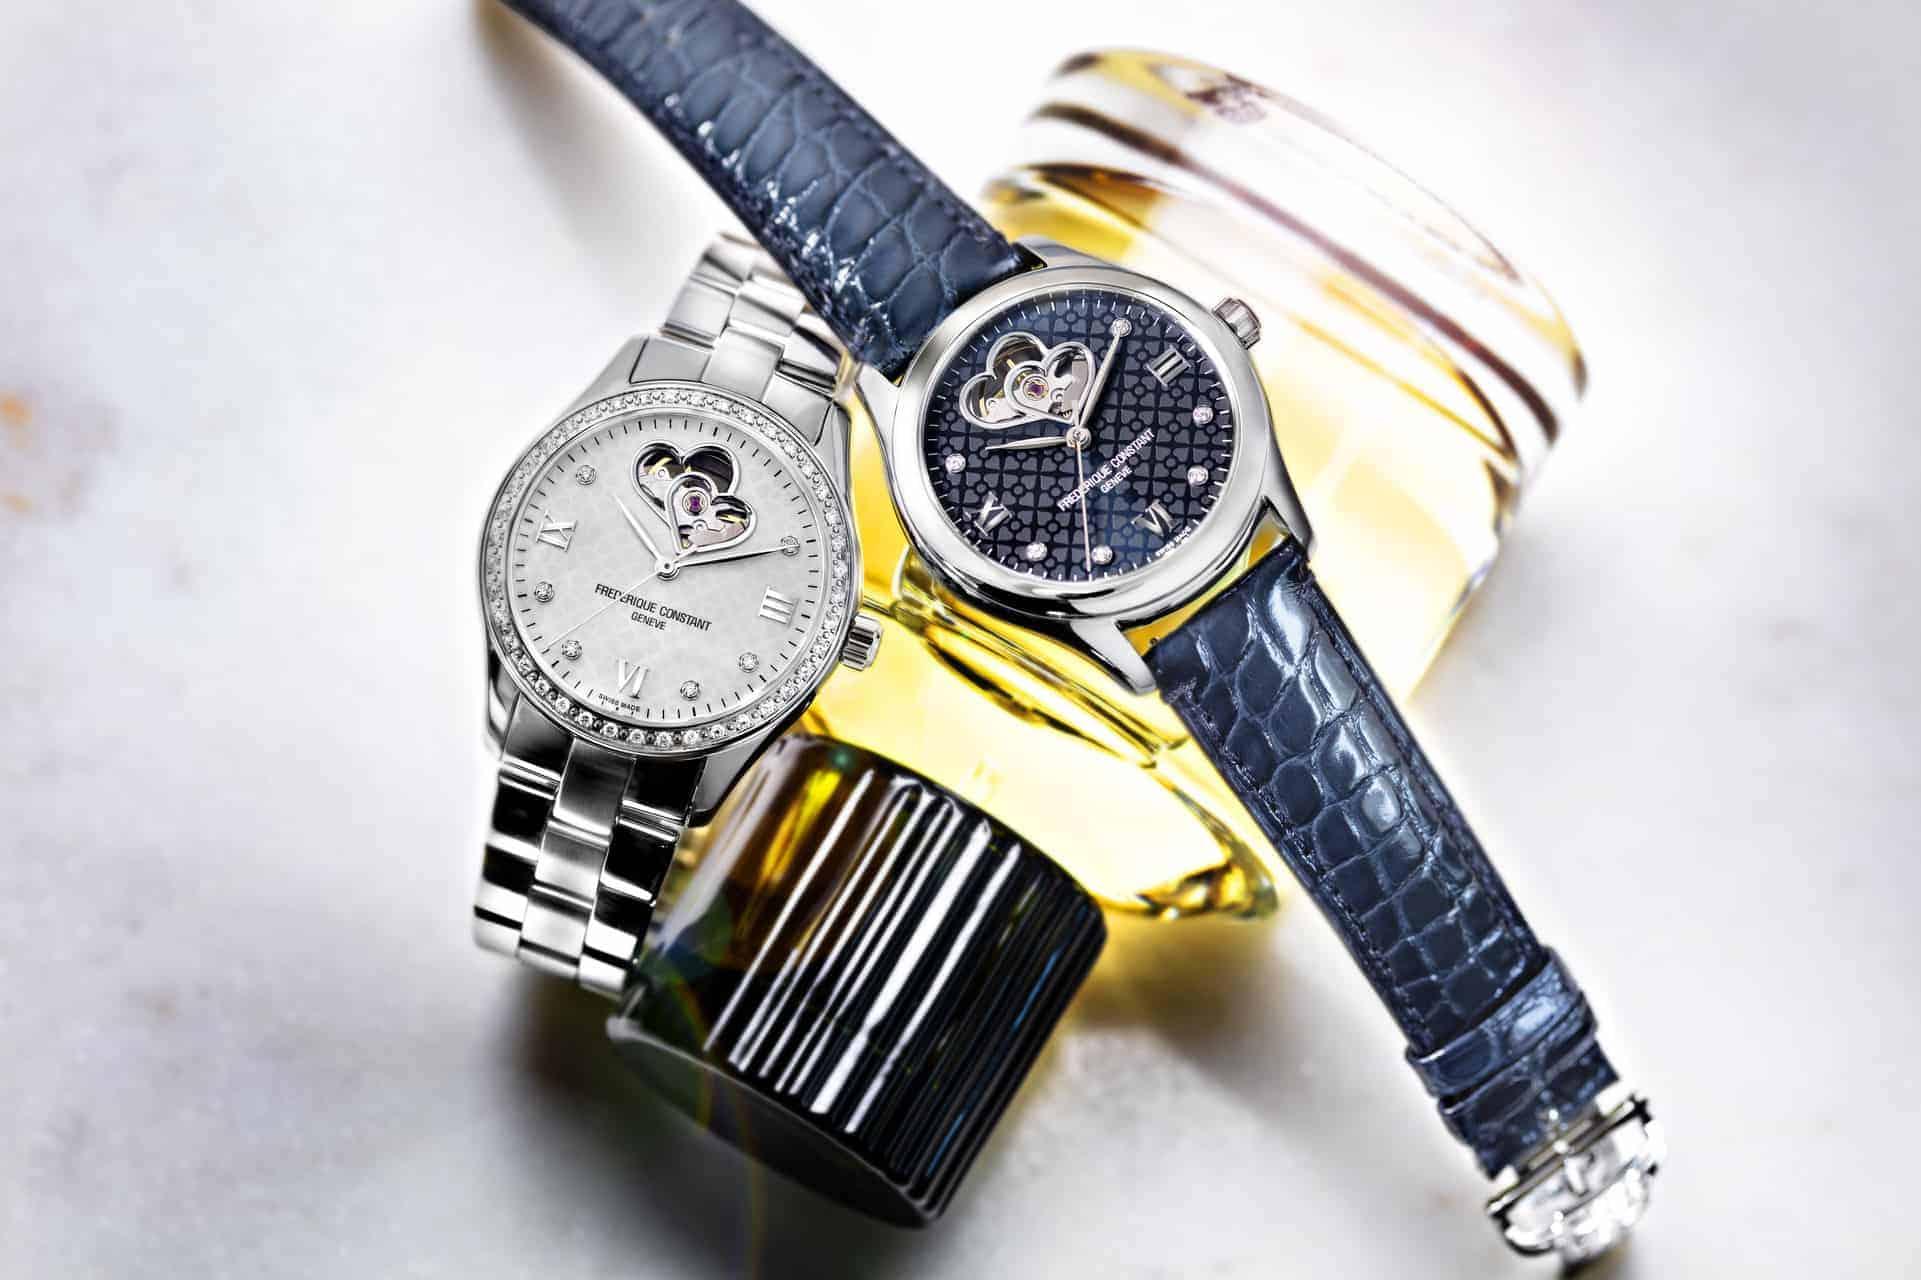 Frederique Constant Ladies Automatic: the new signature timepieces